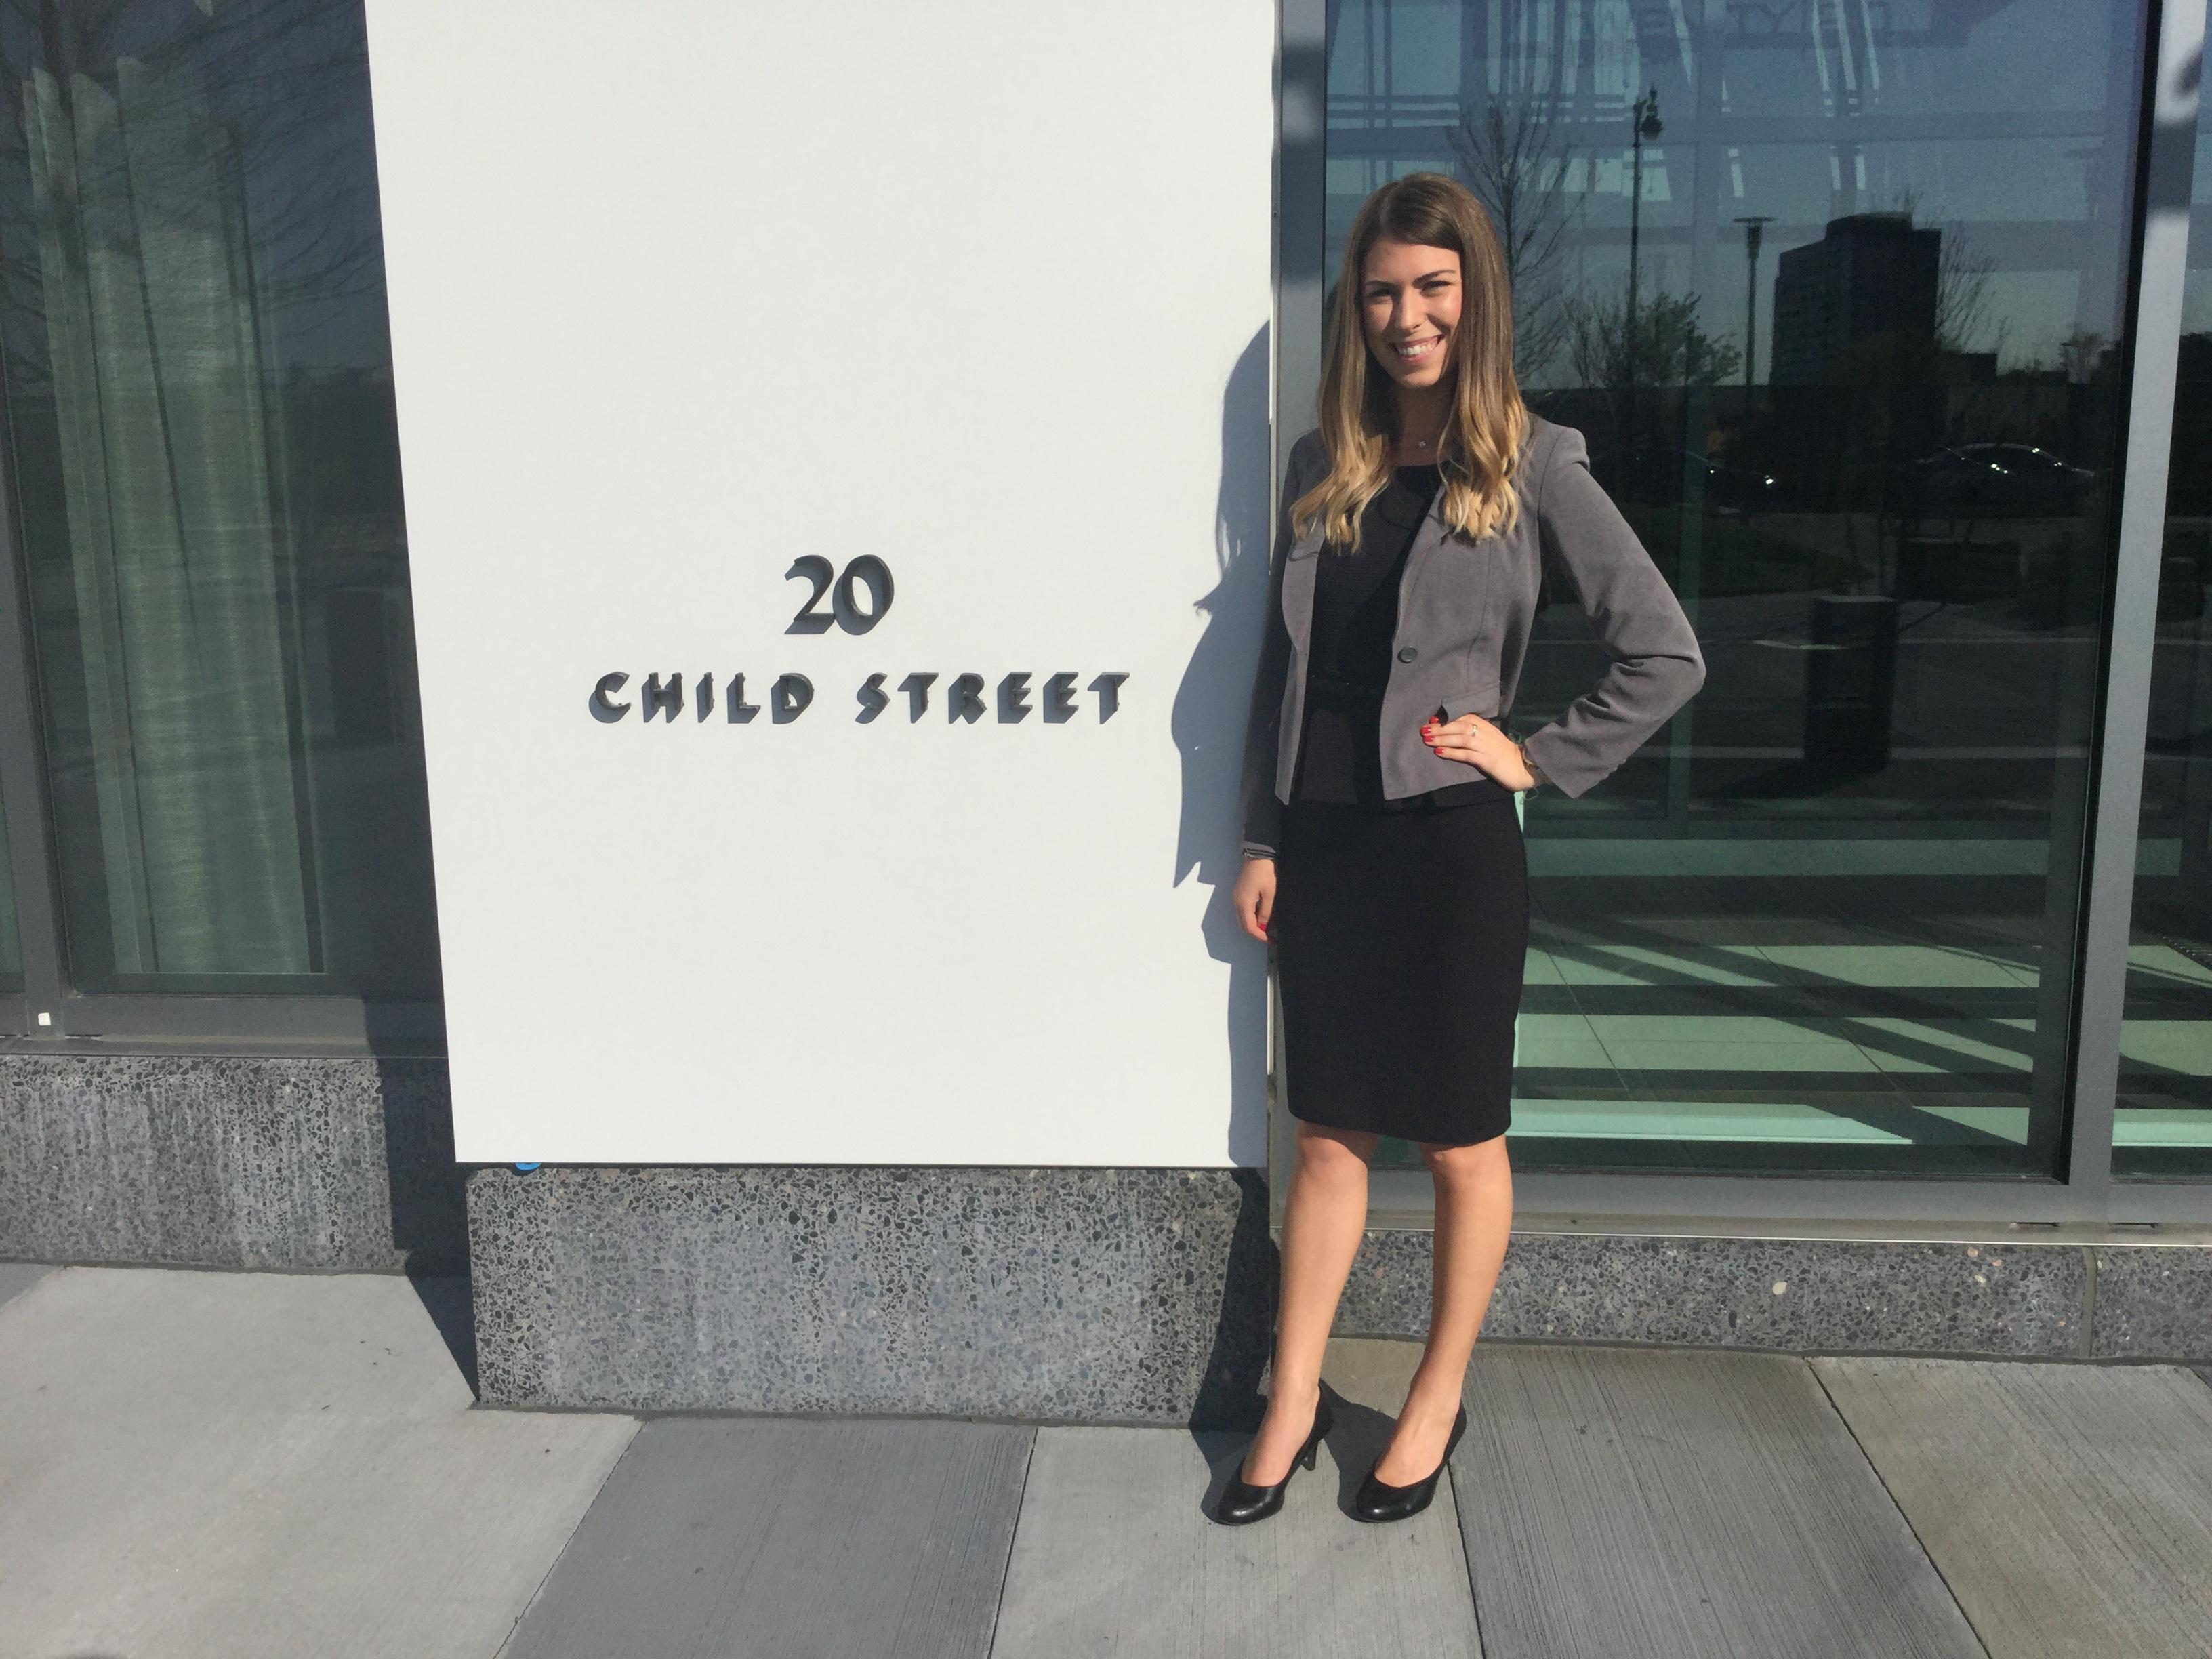 Meet the team at Twenty | 20: Emily Lemmon